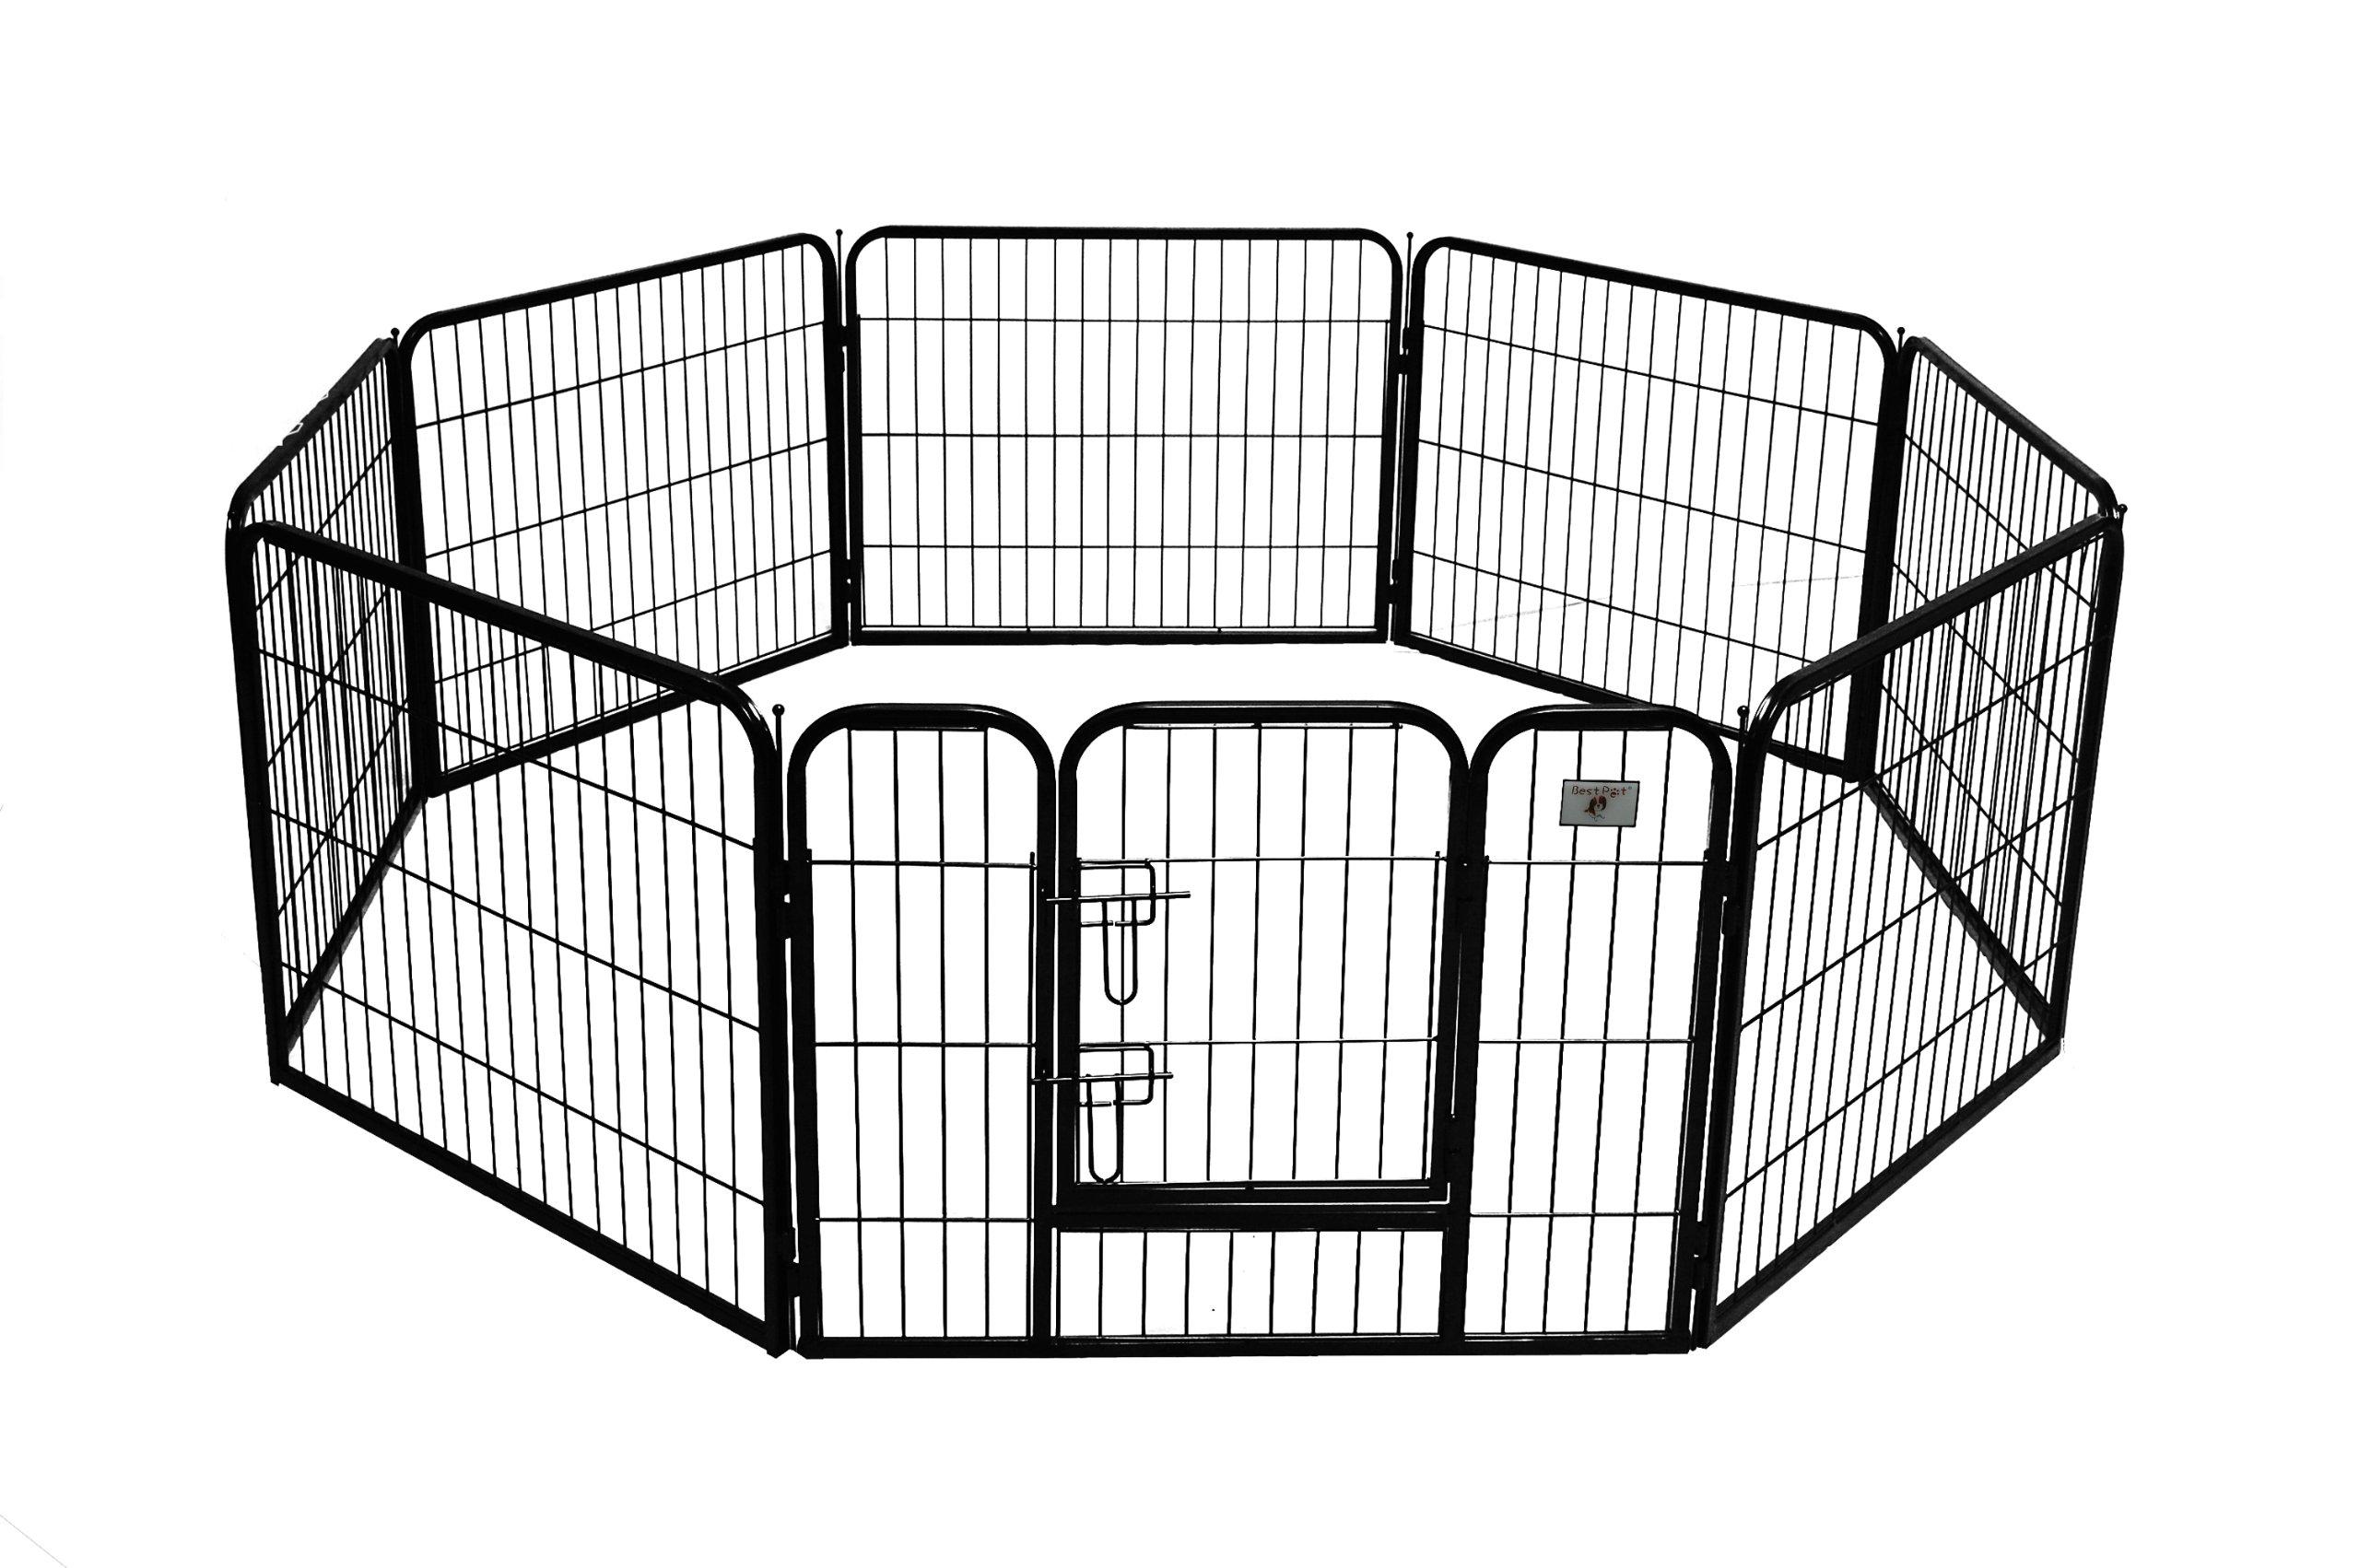 BestPet Heavy Duty Pet Playpen Dog Cat Fence B Exercise Pen, 24-Inch, Black by BestPet